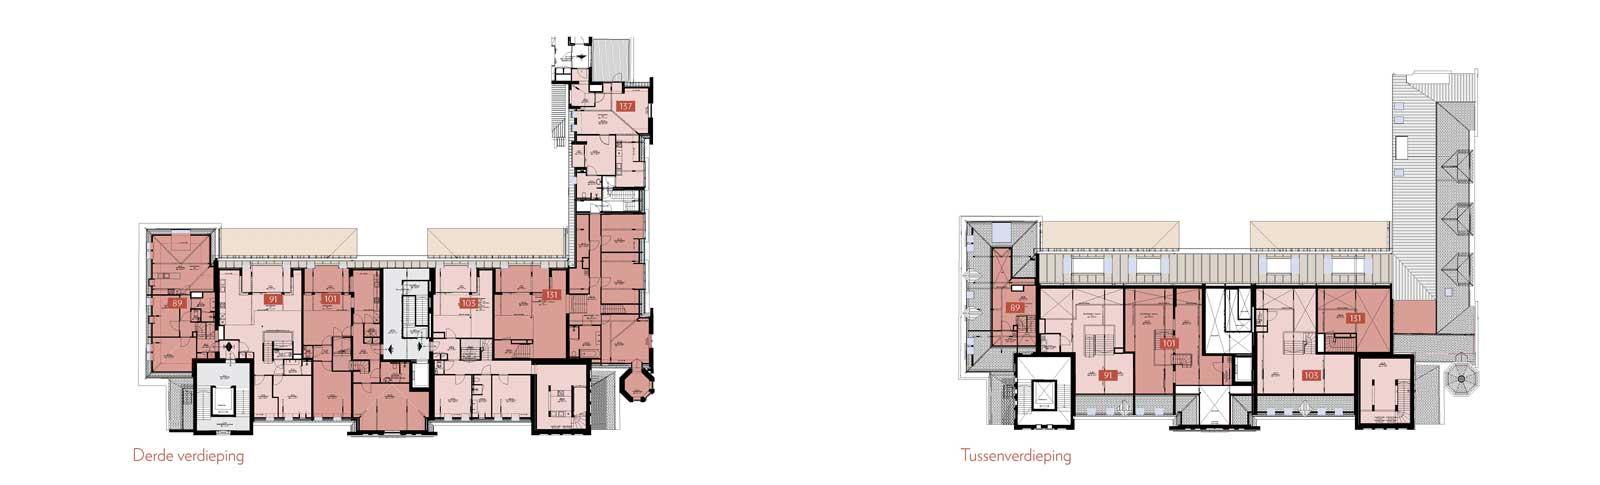 derde verdieping en tussenverdieping - Rijksmonument Ooglijdersgasthuis Utrecht